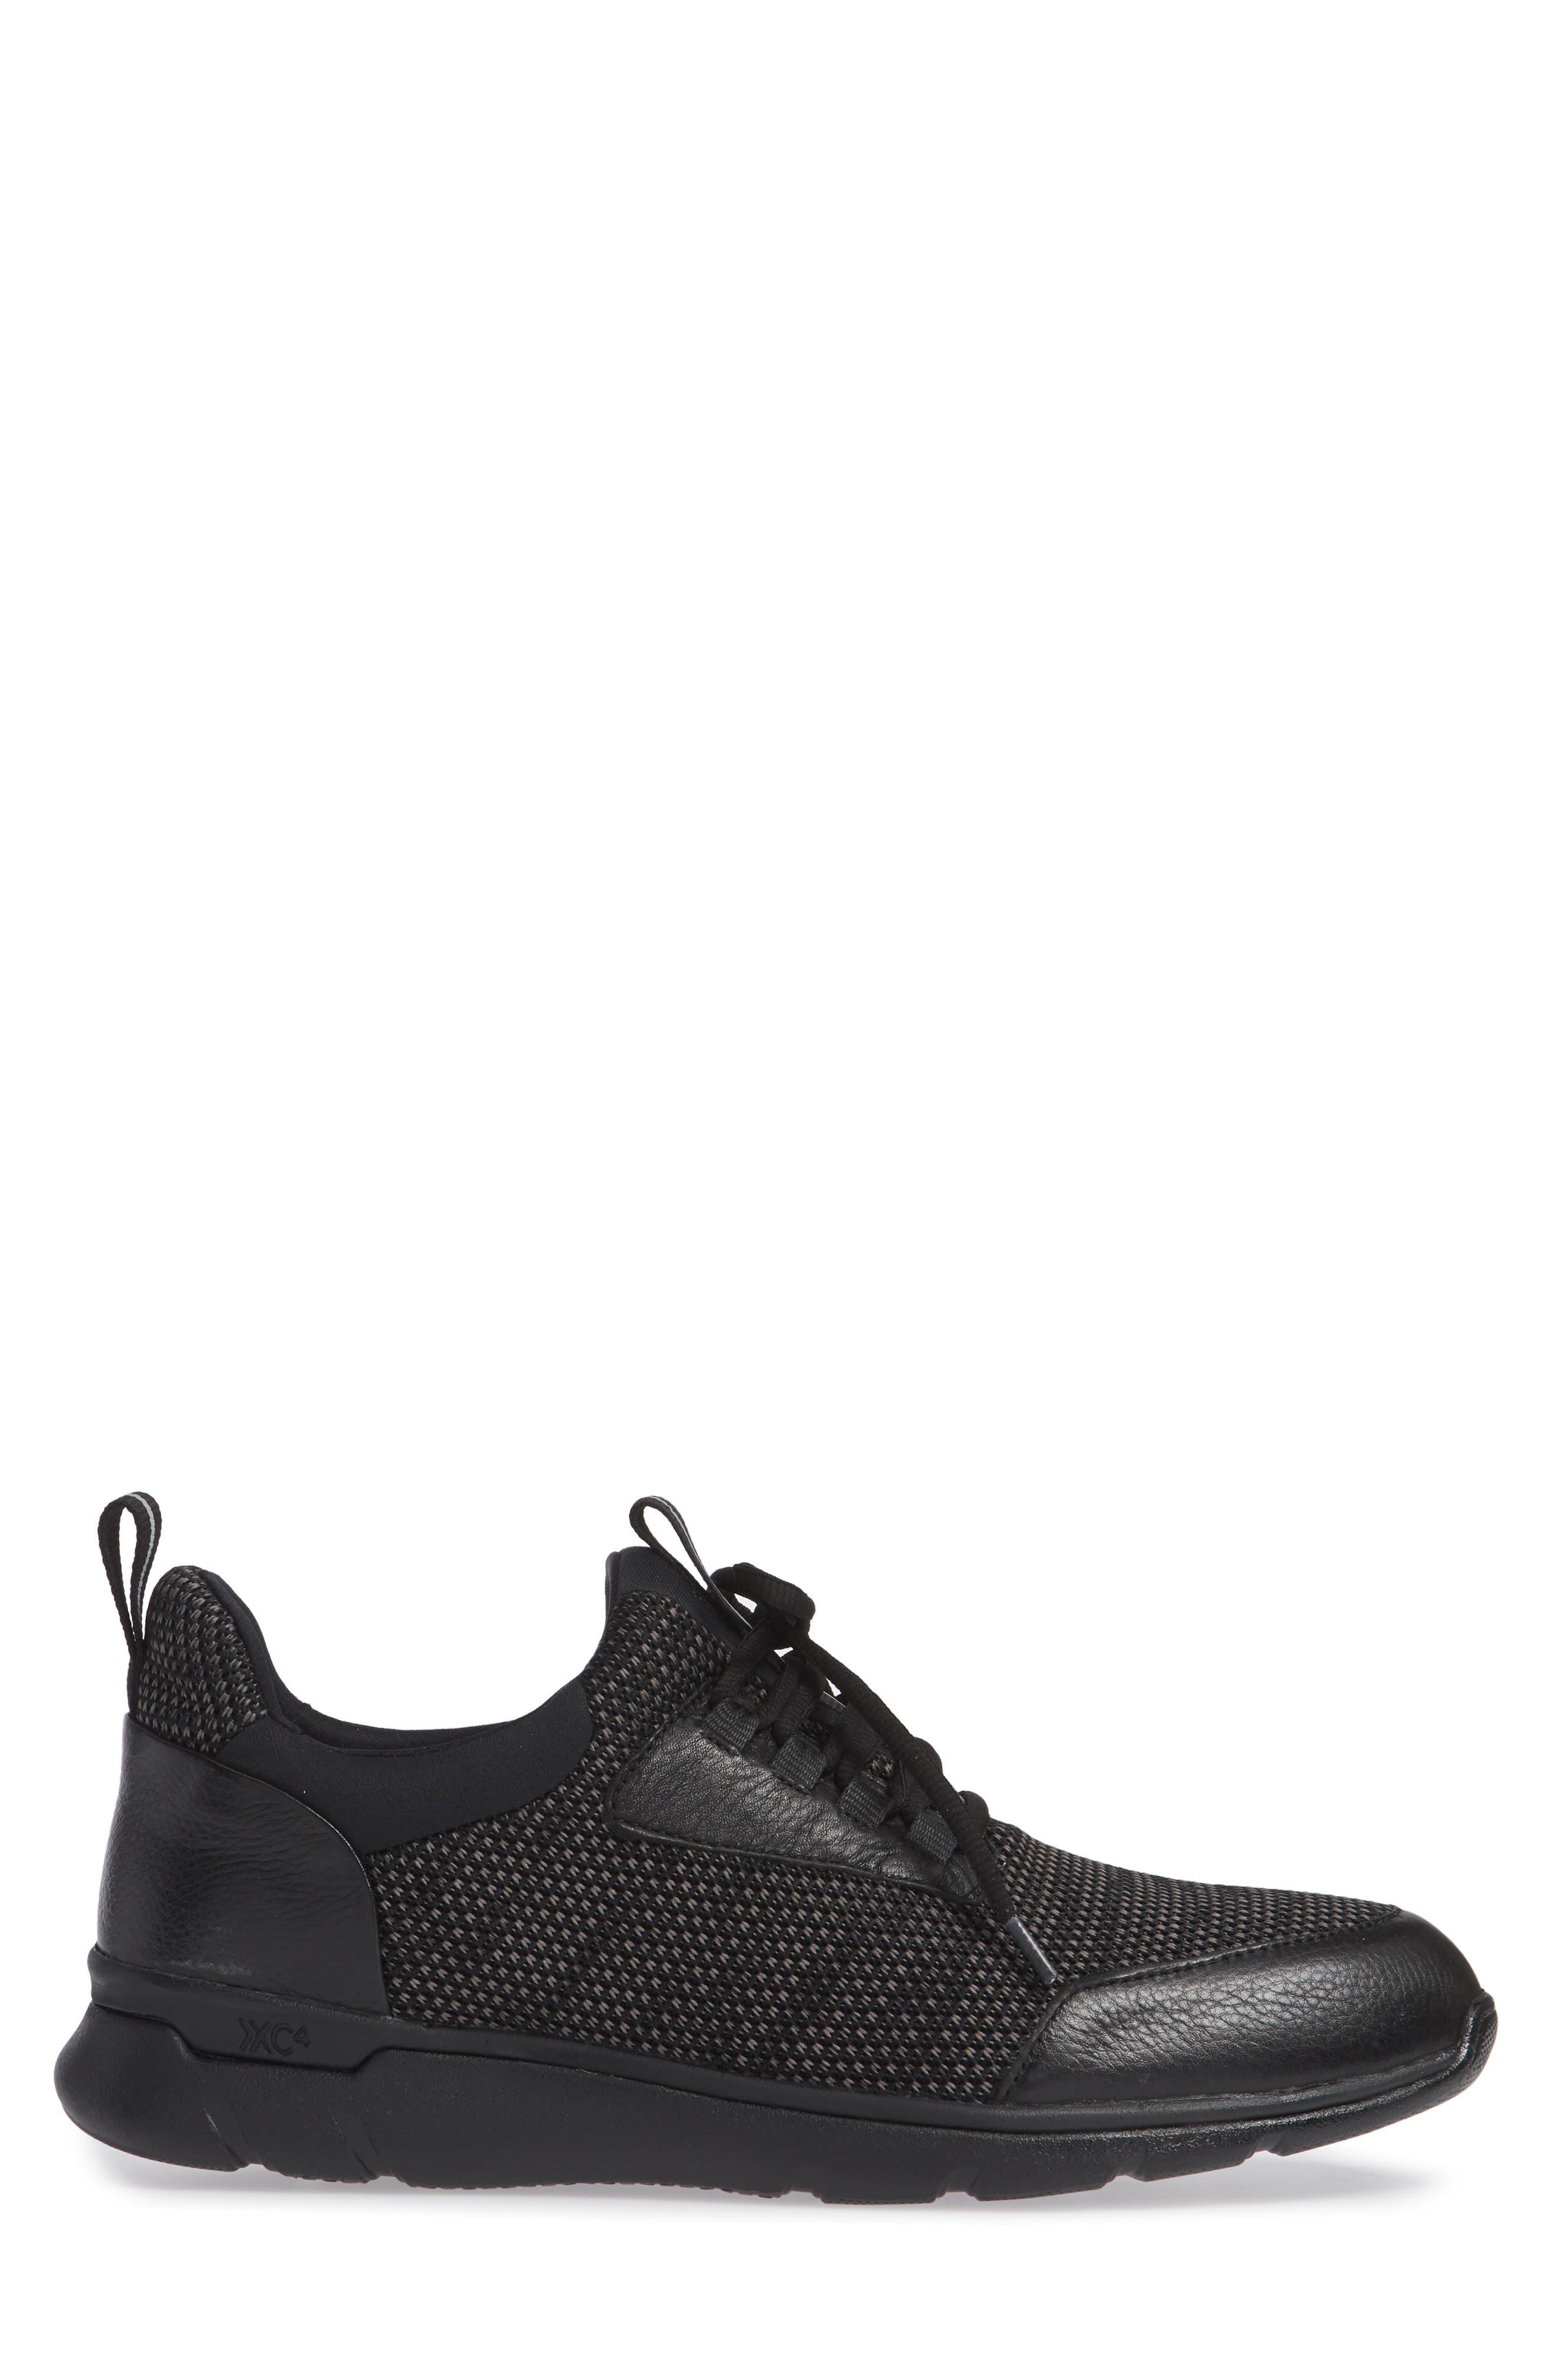 JOHNSTON & MURPHY, Prentiss XC4<sup>®</sup> Waterproof Sneaker, Alternate thumbnail 3, color, BLACK LEATHER